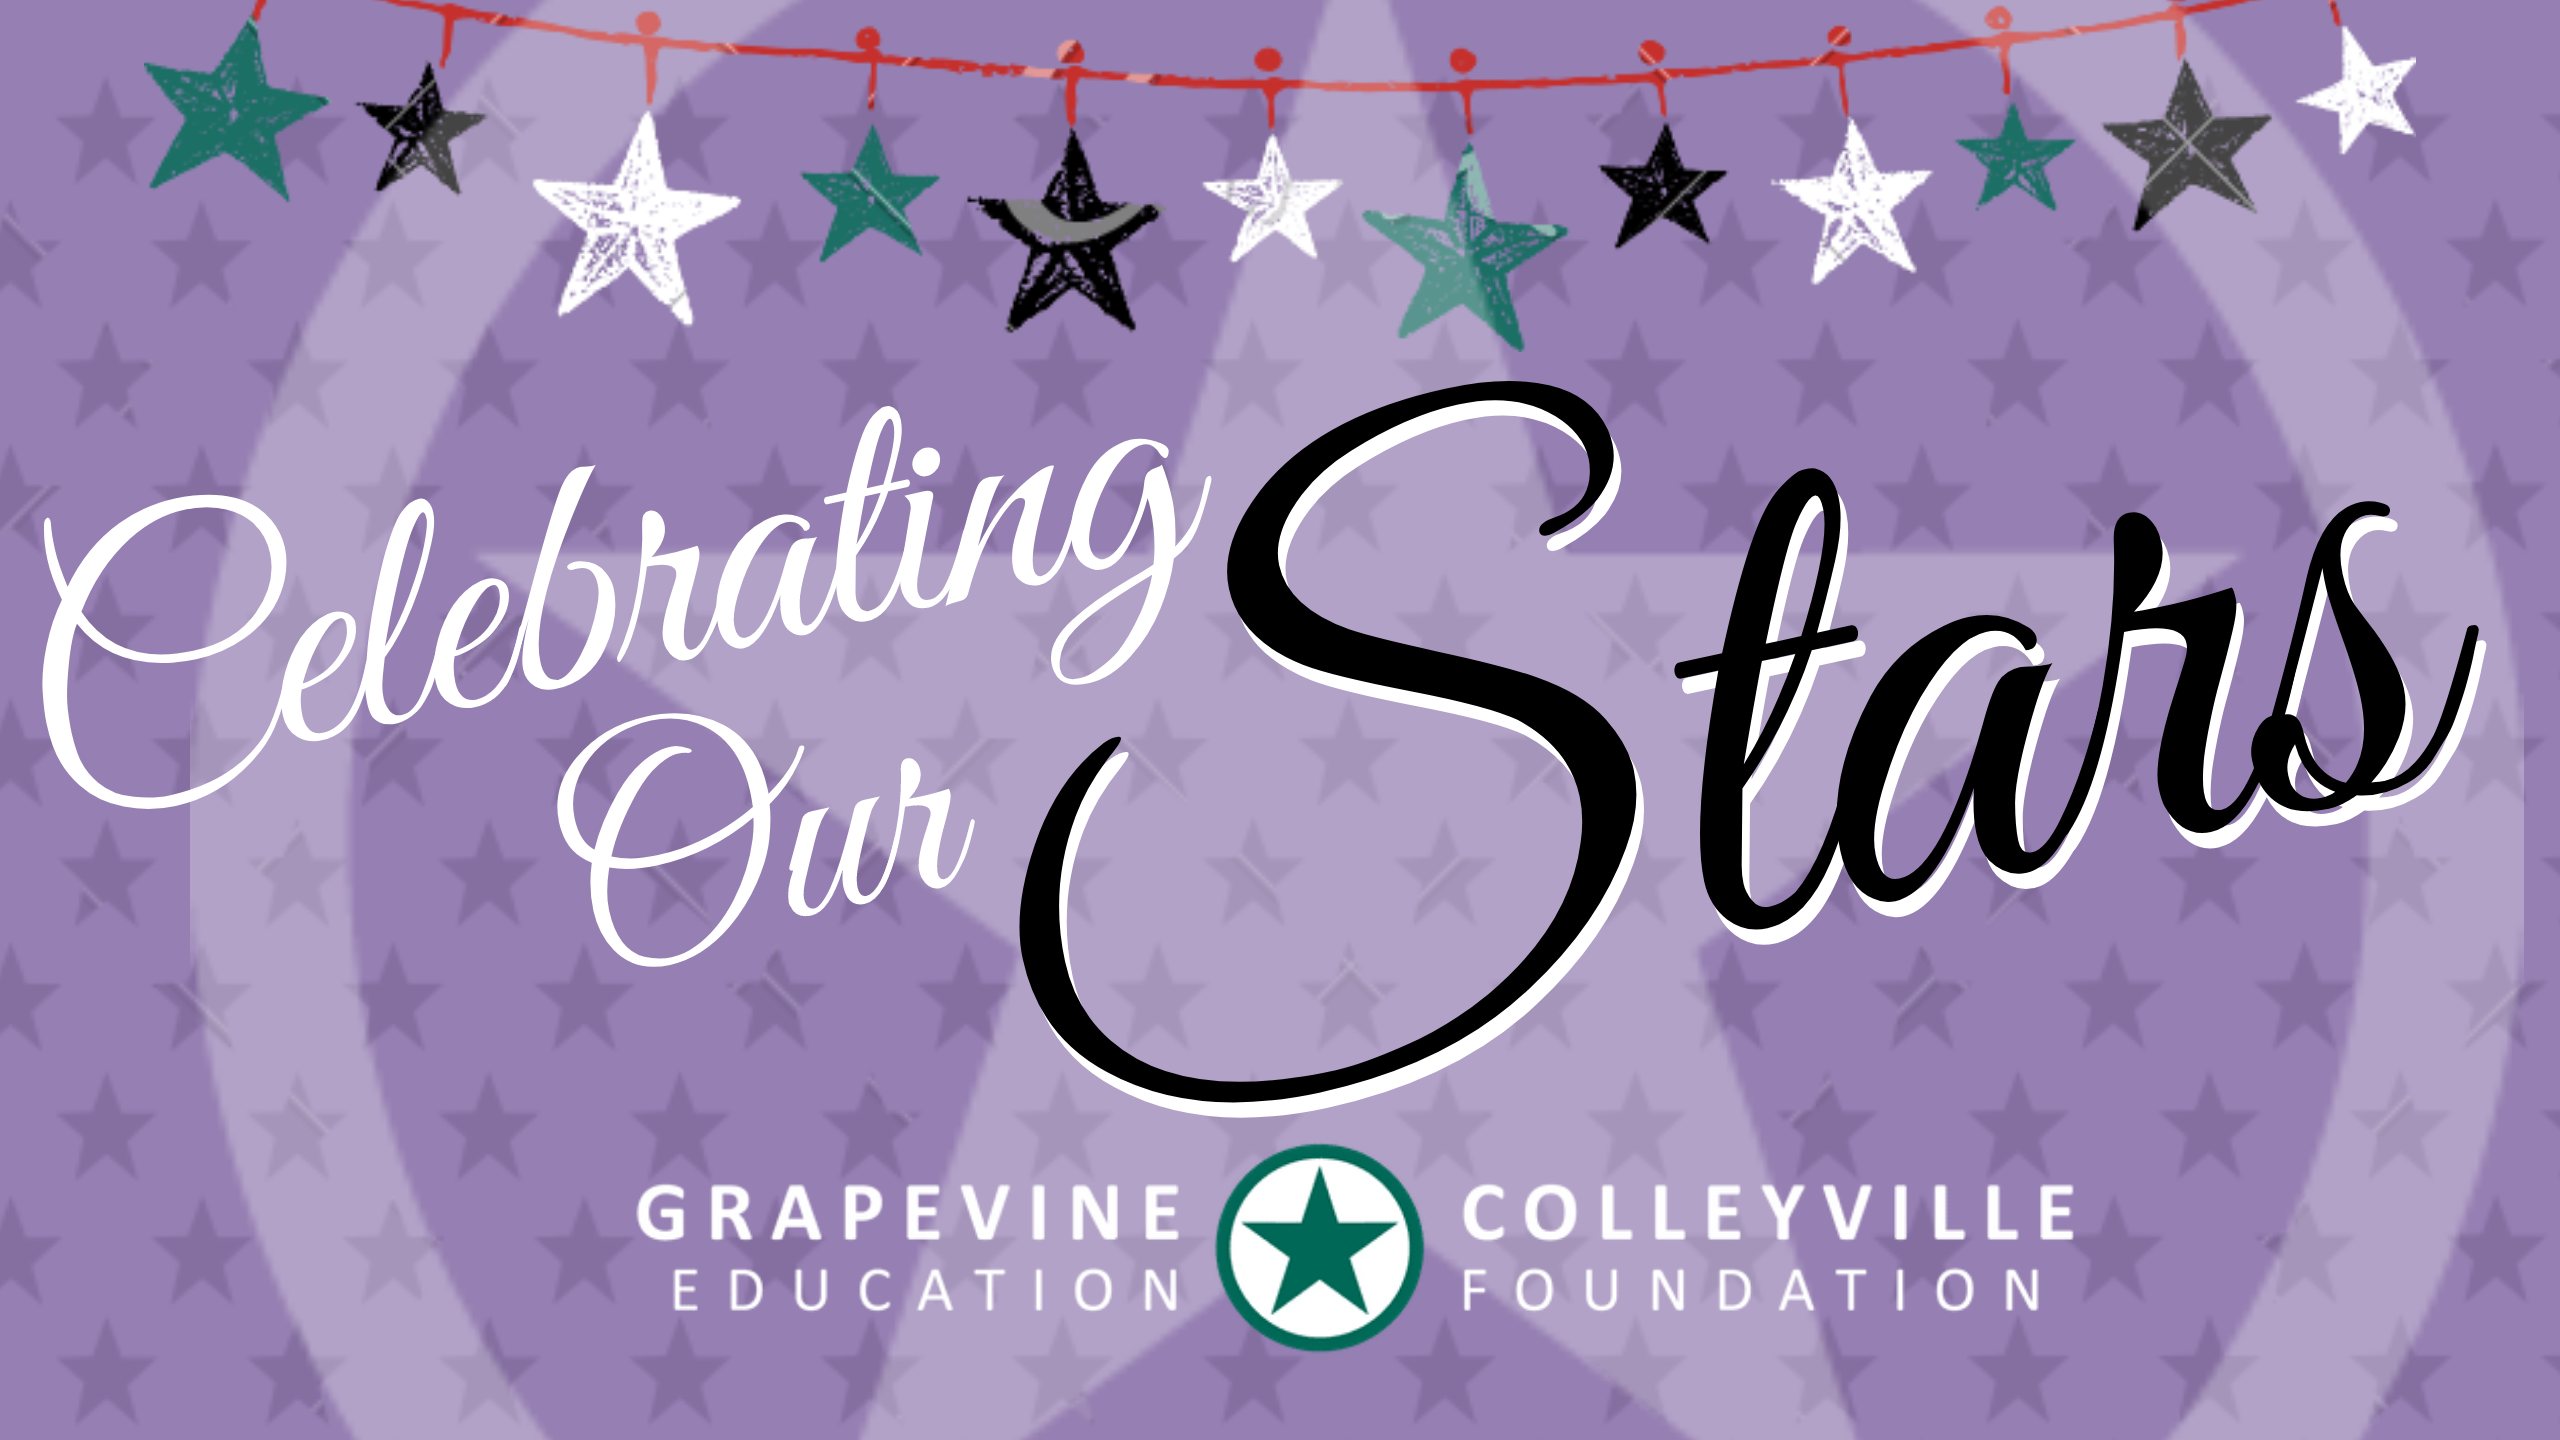 Celebrating our Stars